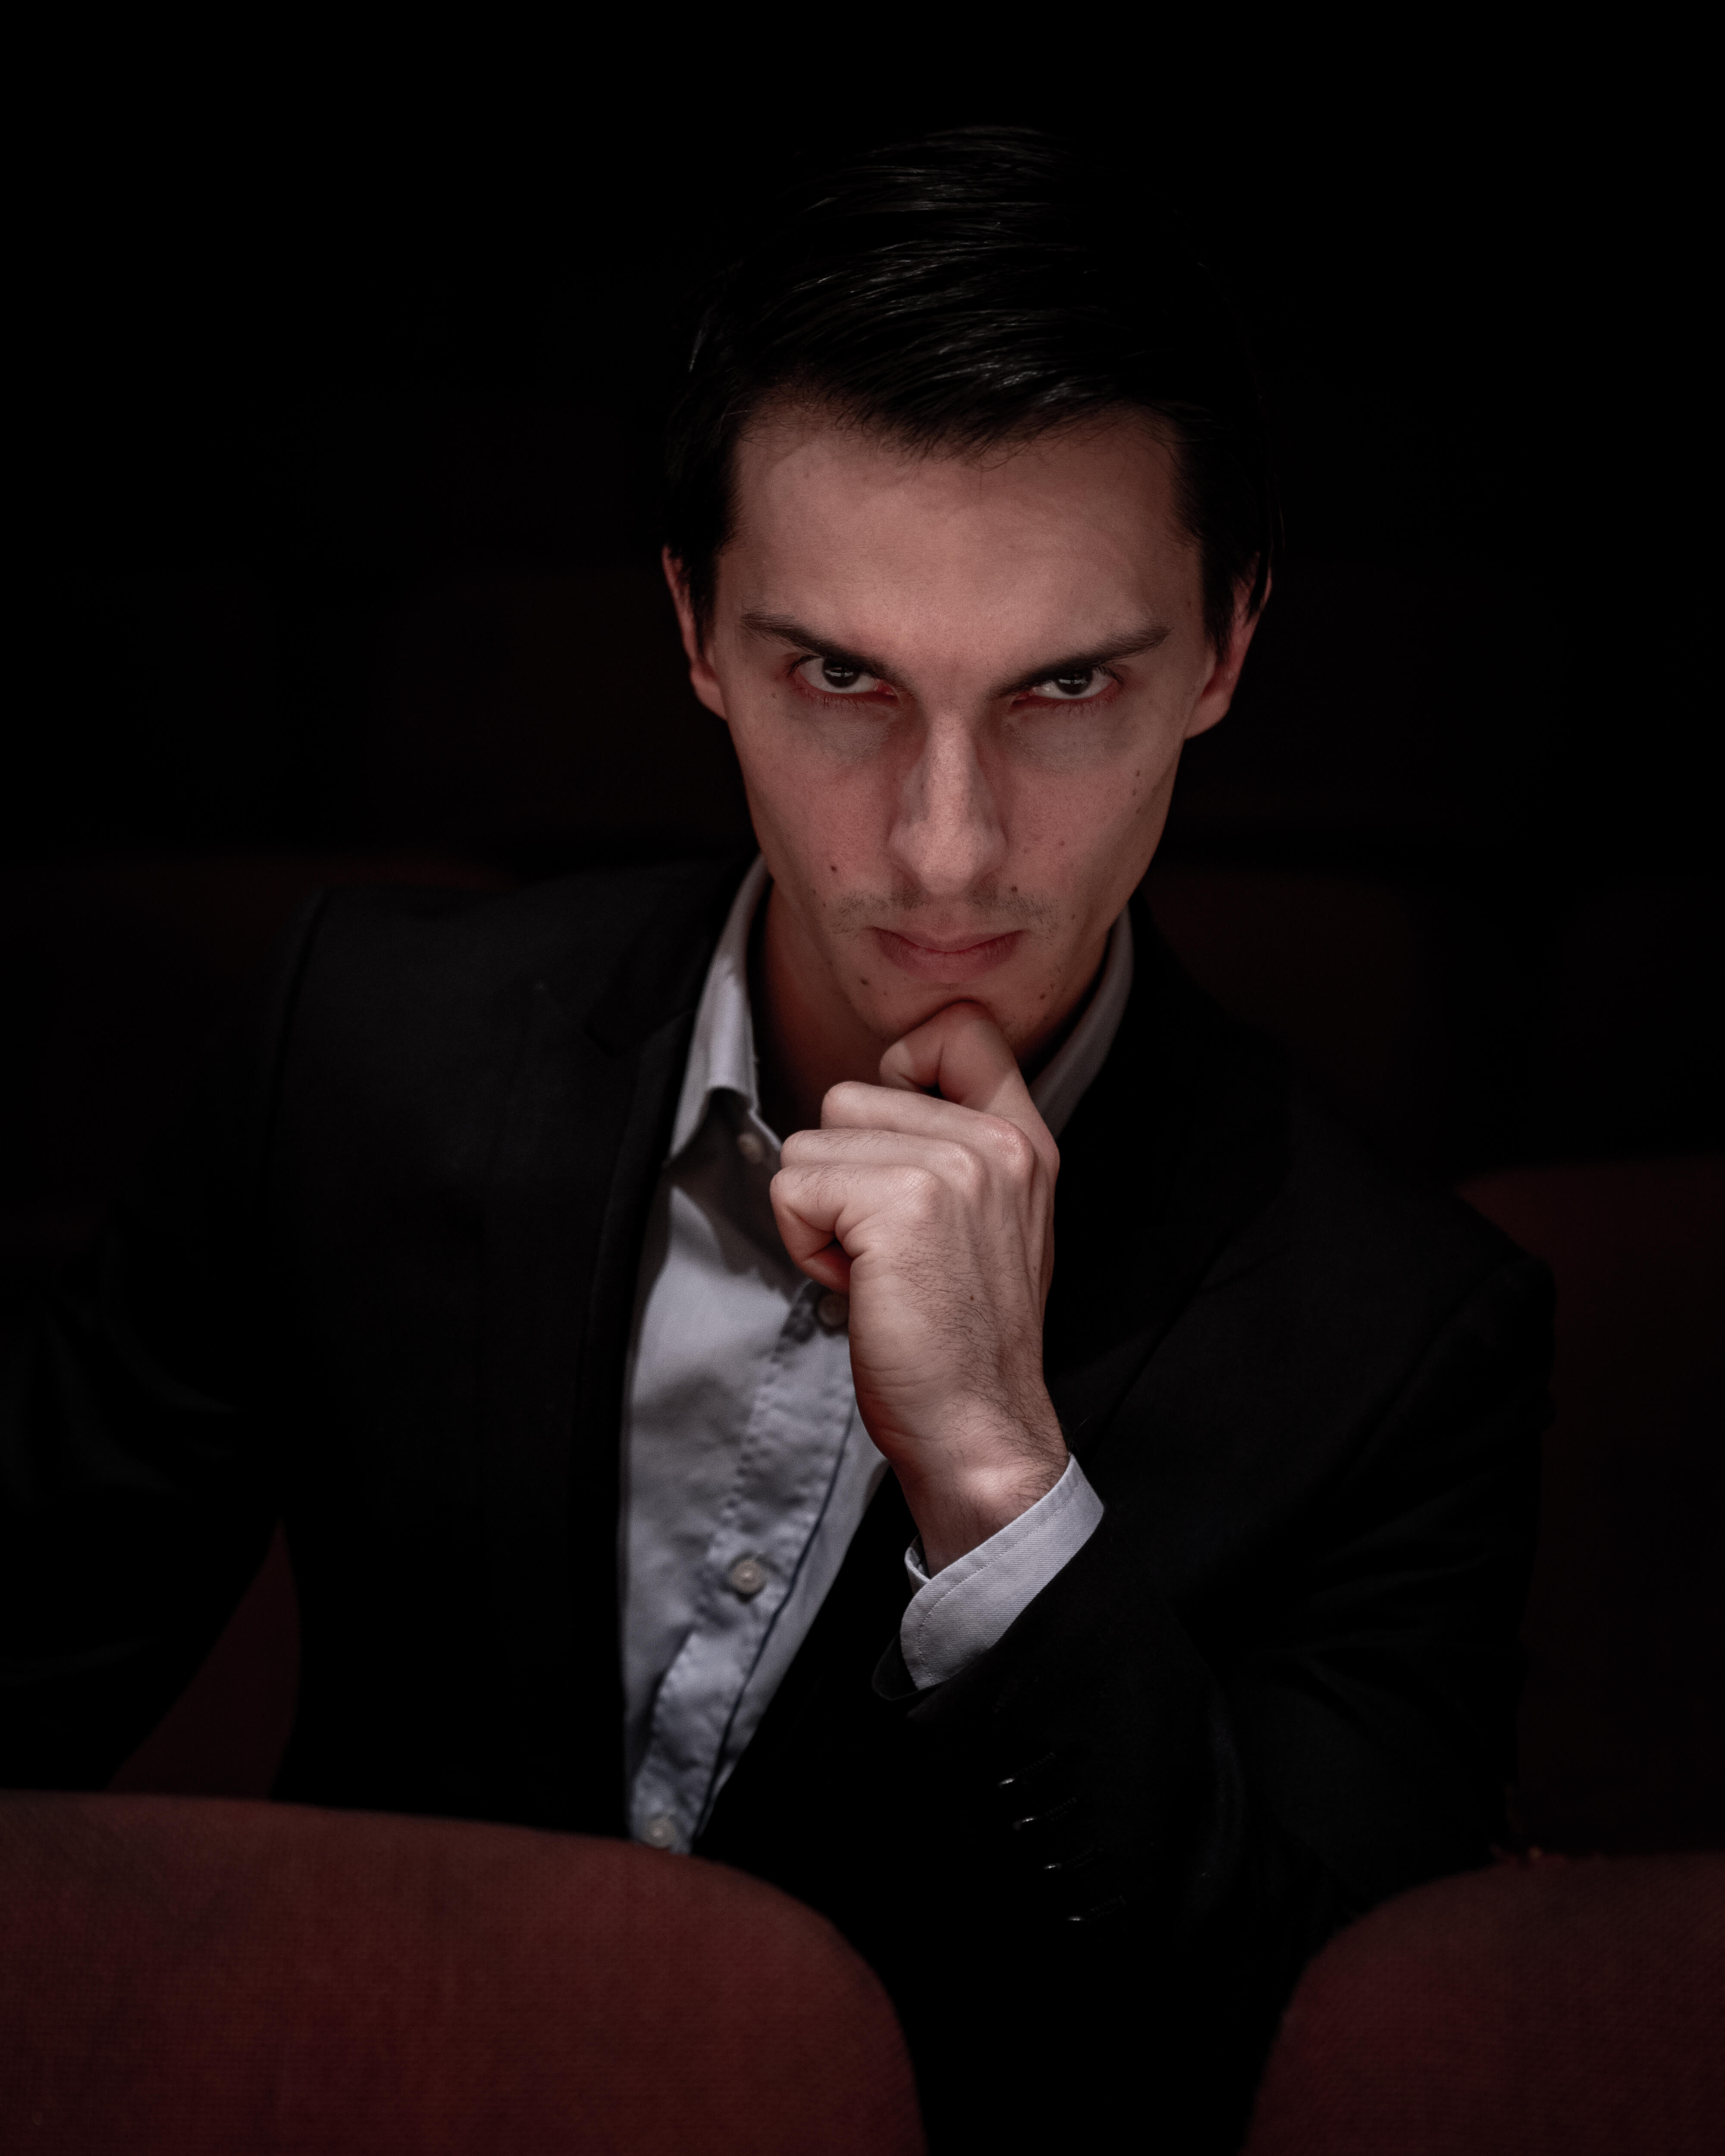 A provocative photo portrait of composer and music teacher Liam Pitcher.